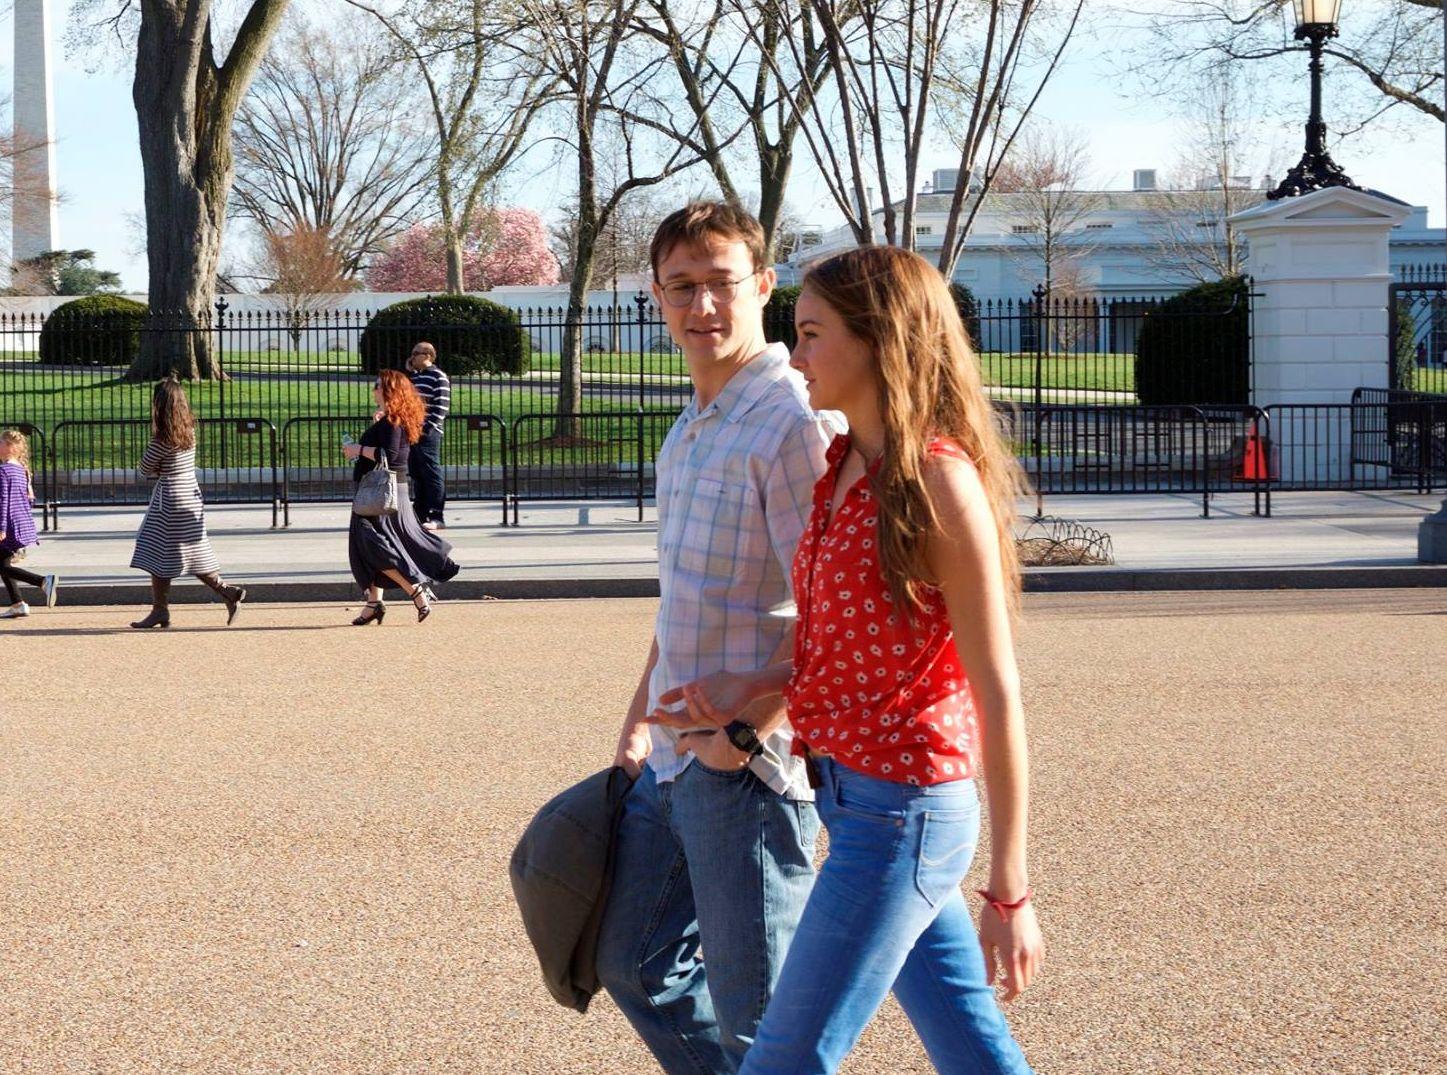 Shailene Woodley and Joseph Gordon-Levitt in Snowden biopic